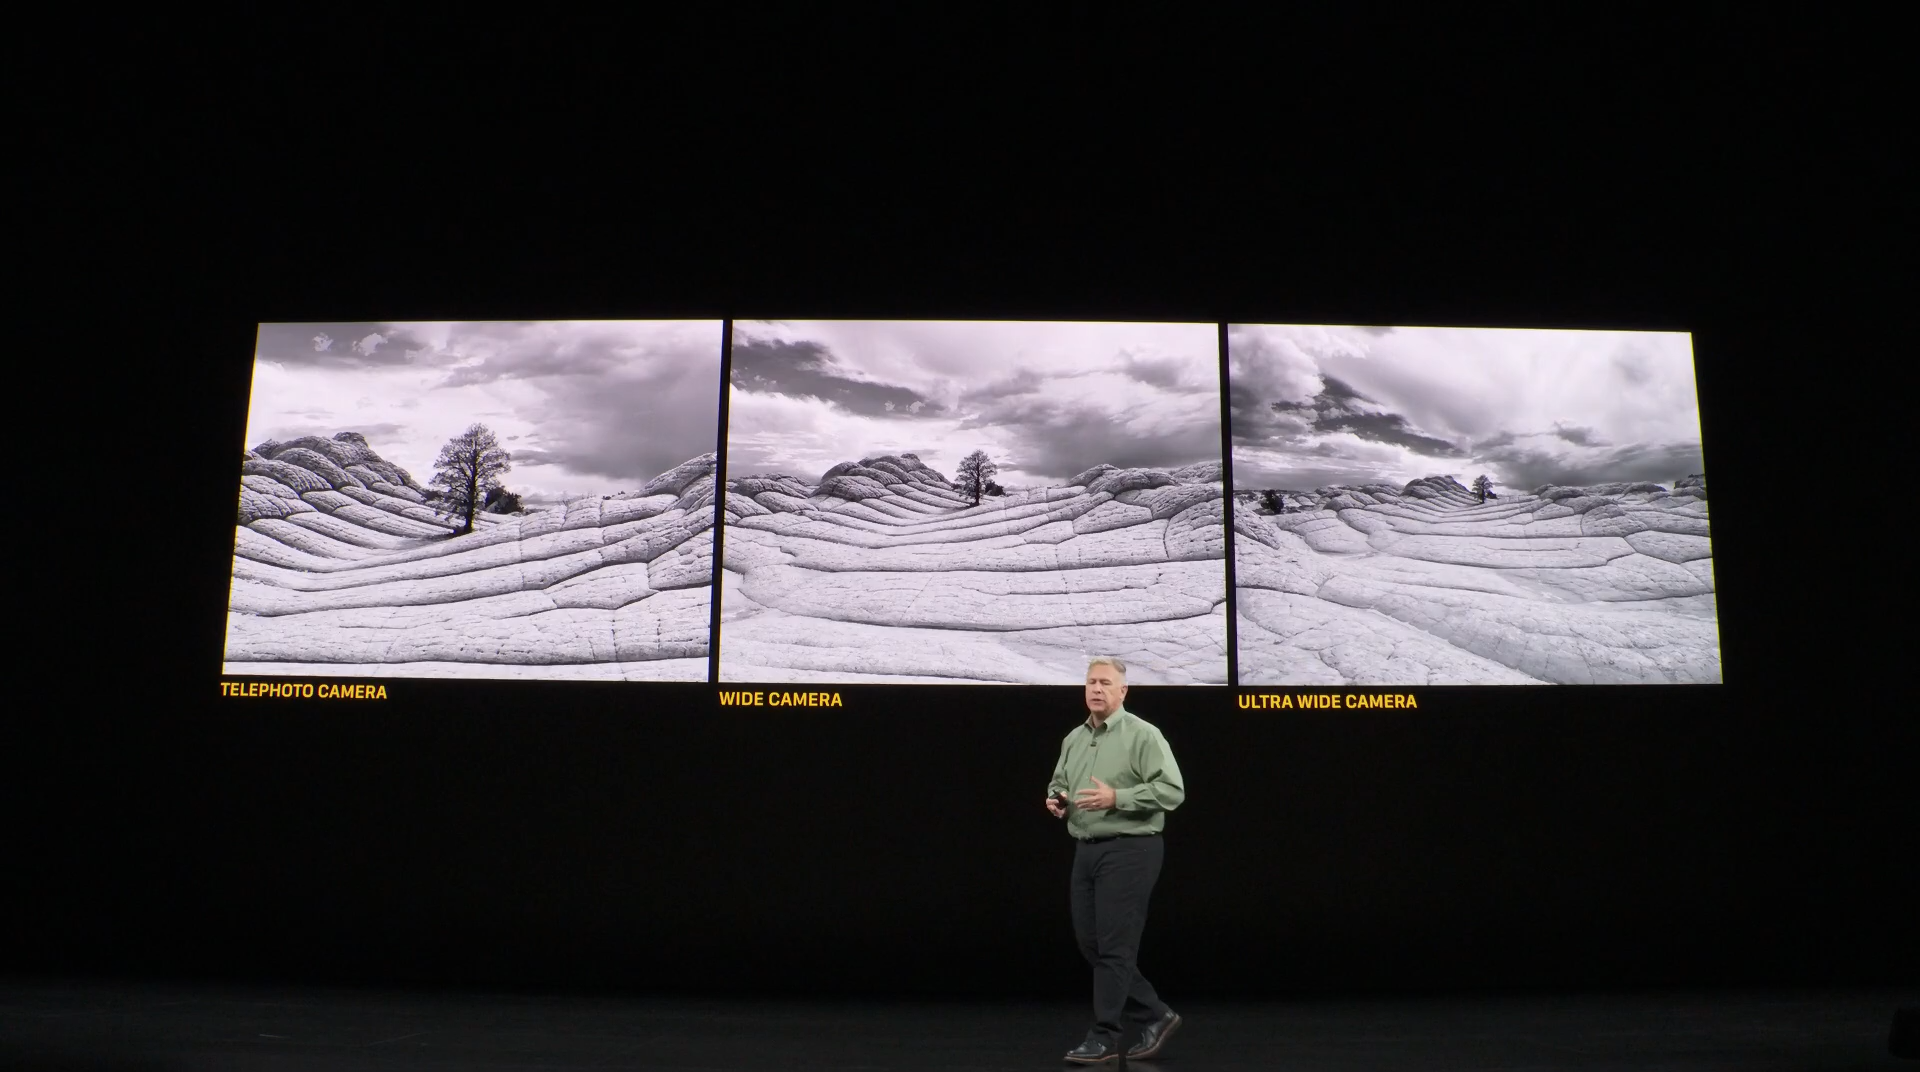 iPhone11 pro追加了超廣角鏡頭,左至右讓手機更貼近專業相機,接著你就要再花錢買更好的APP。